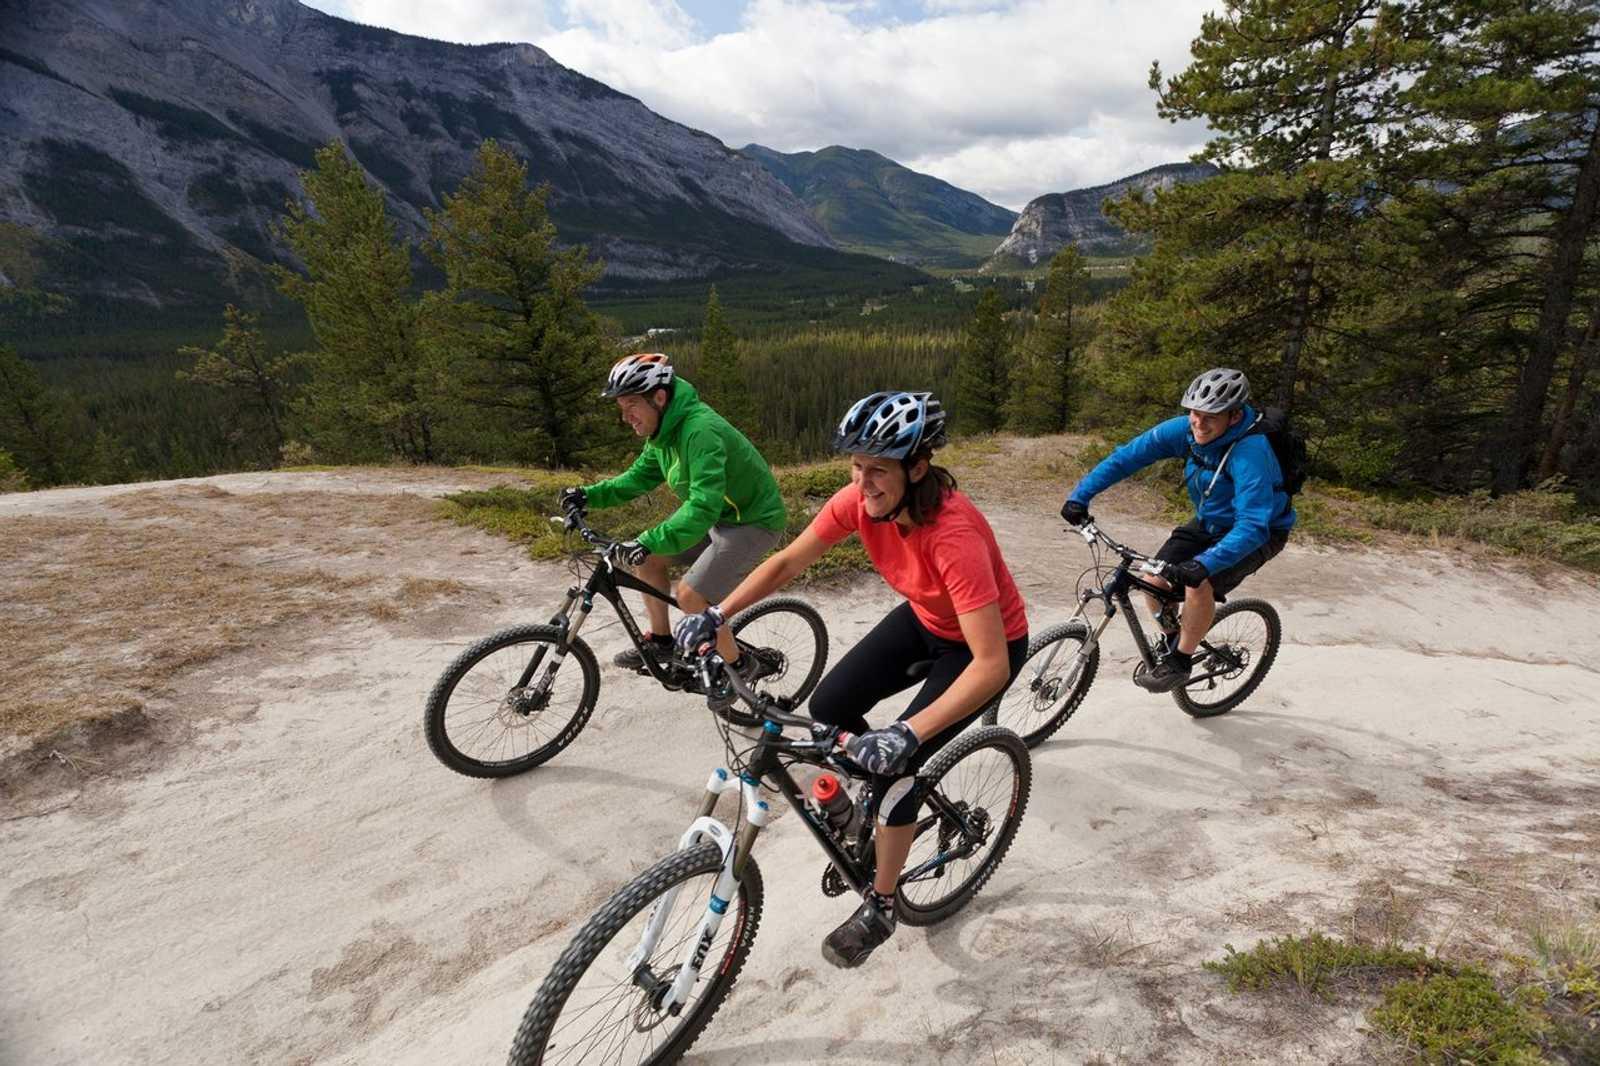 Mountain Biking in Banff - Bikers